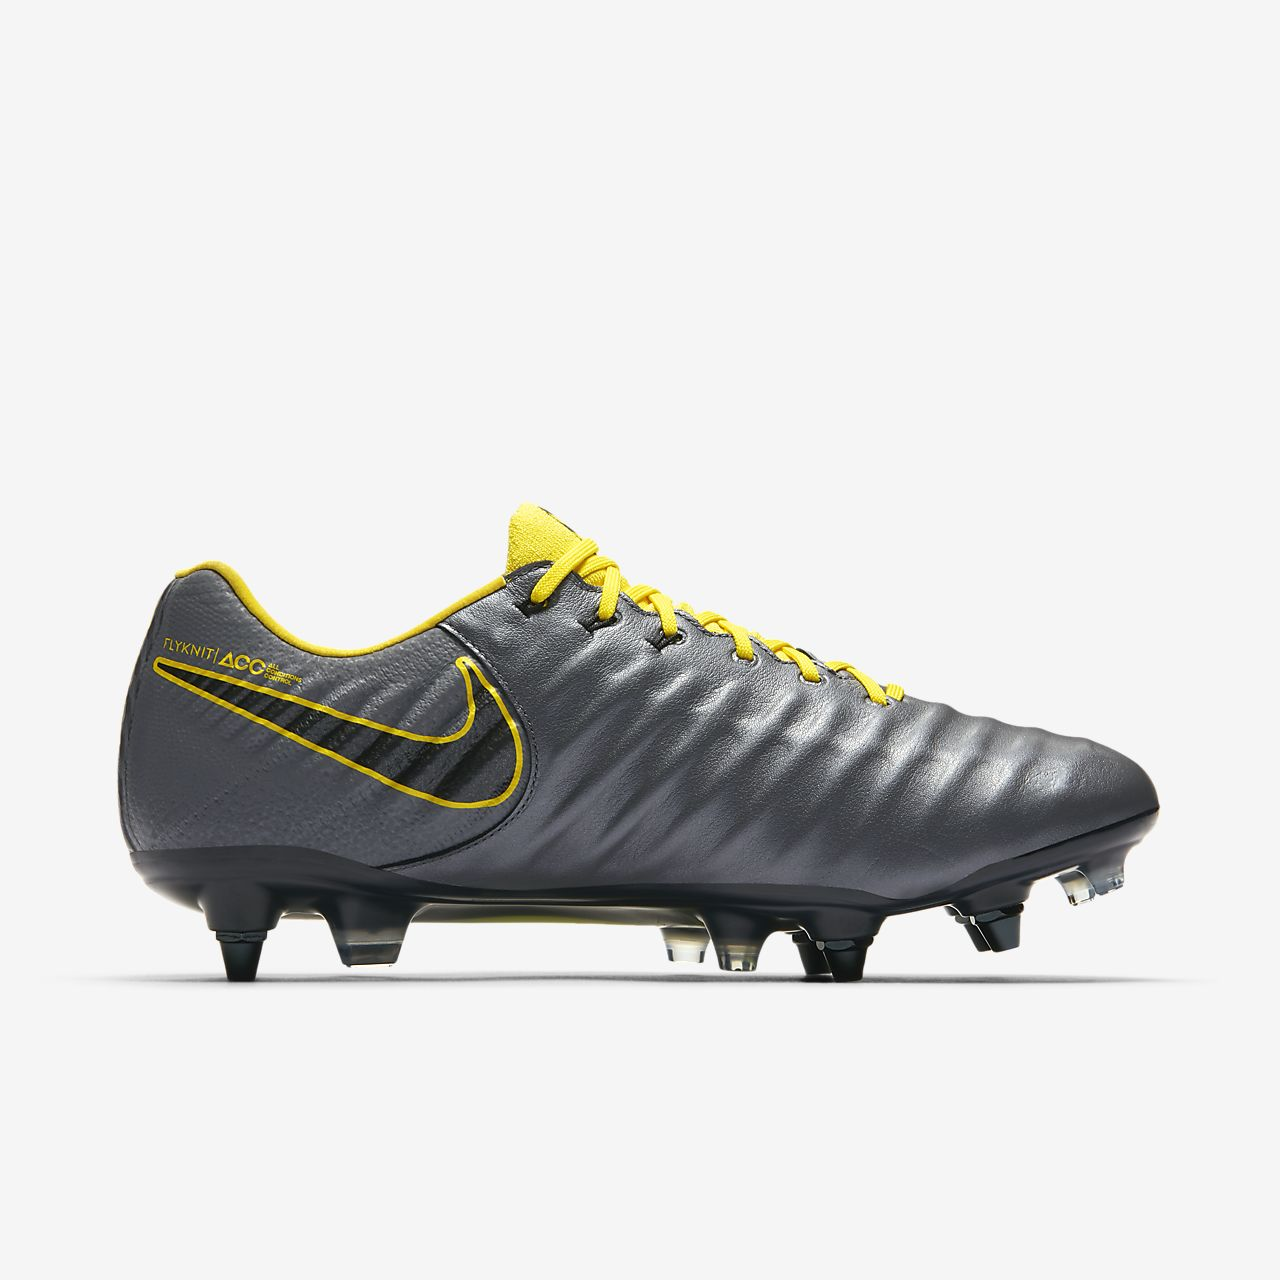 2076481d1ad6b ... Nike Tiempo Legend VII Elite SG-Pro Anti-Clog Botas de fútbol para  terreno